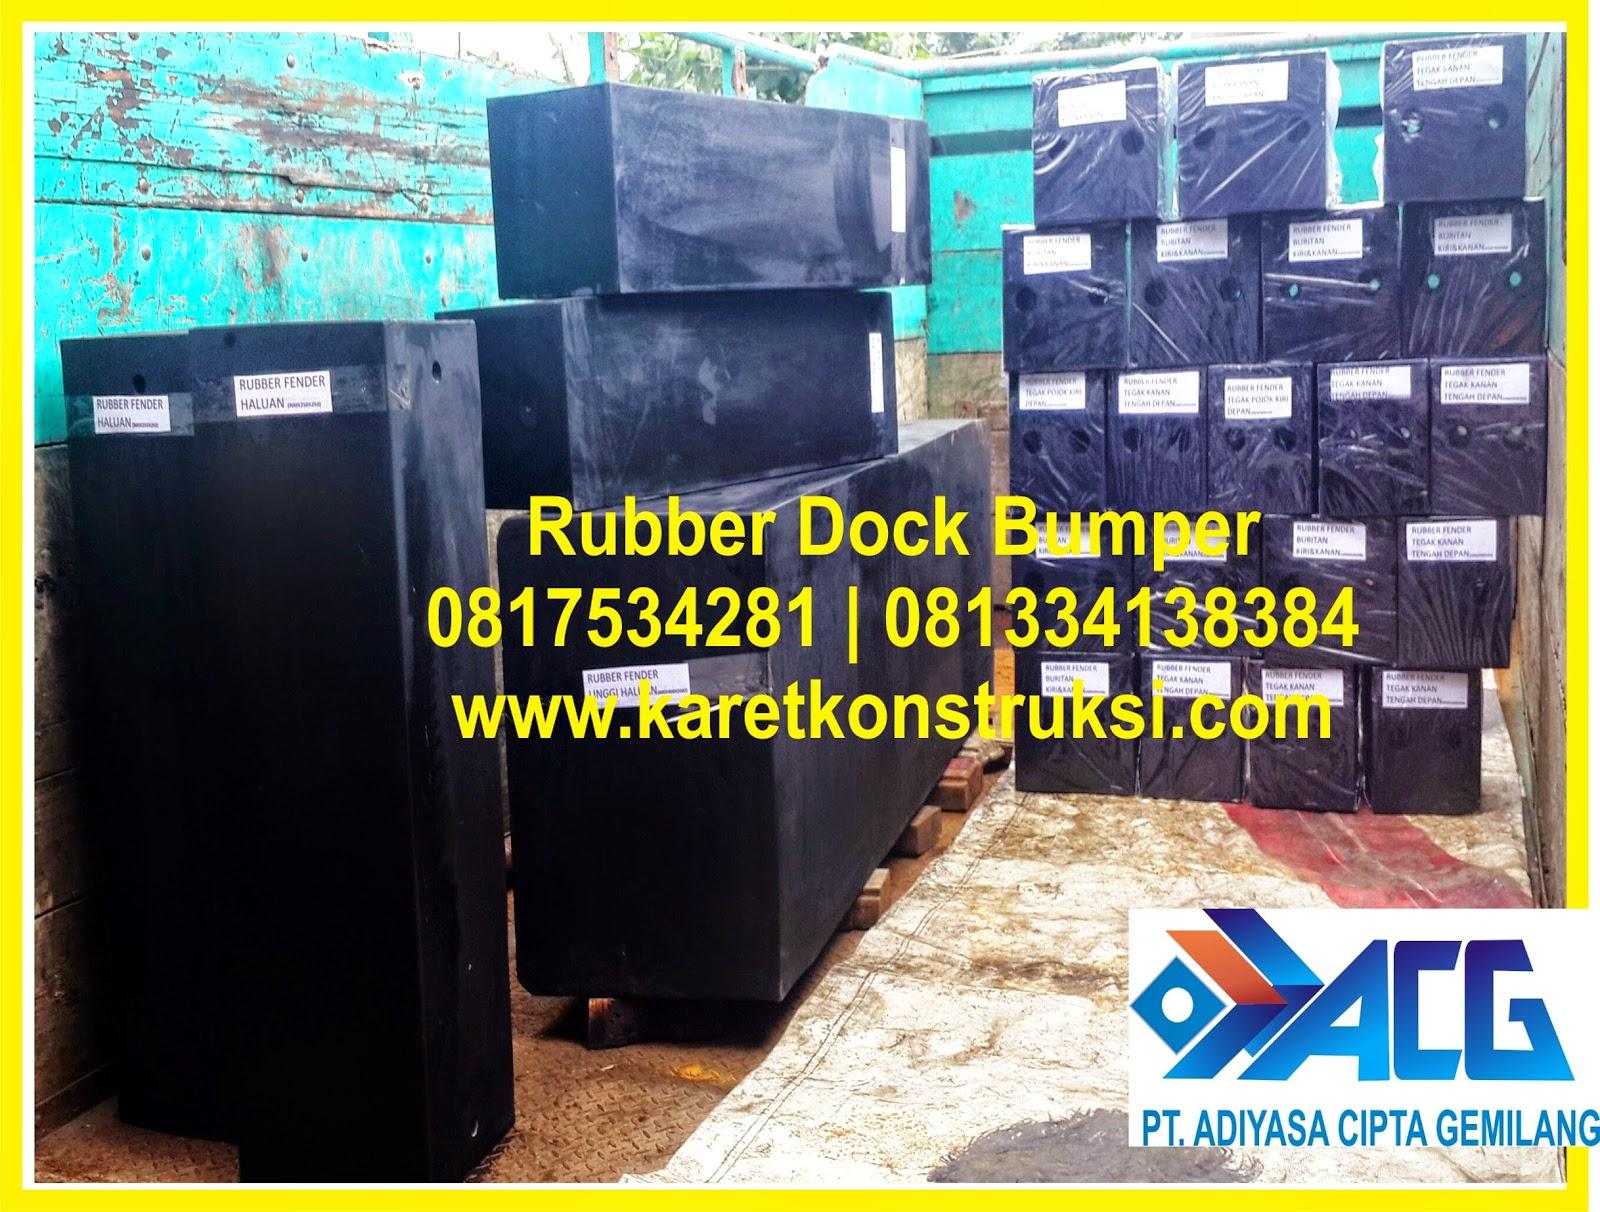 Jual rubber dock , Harga rubber dock bumper , rubber dock fender , rubber dock bumpers truck , rubber dock bumpers suppliers